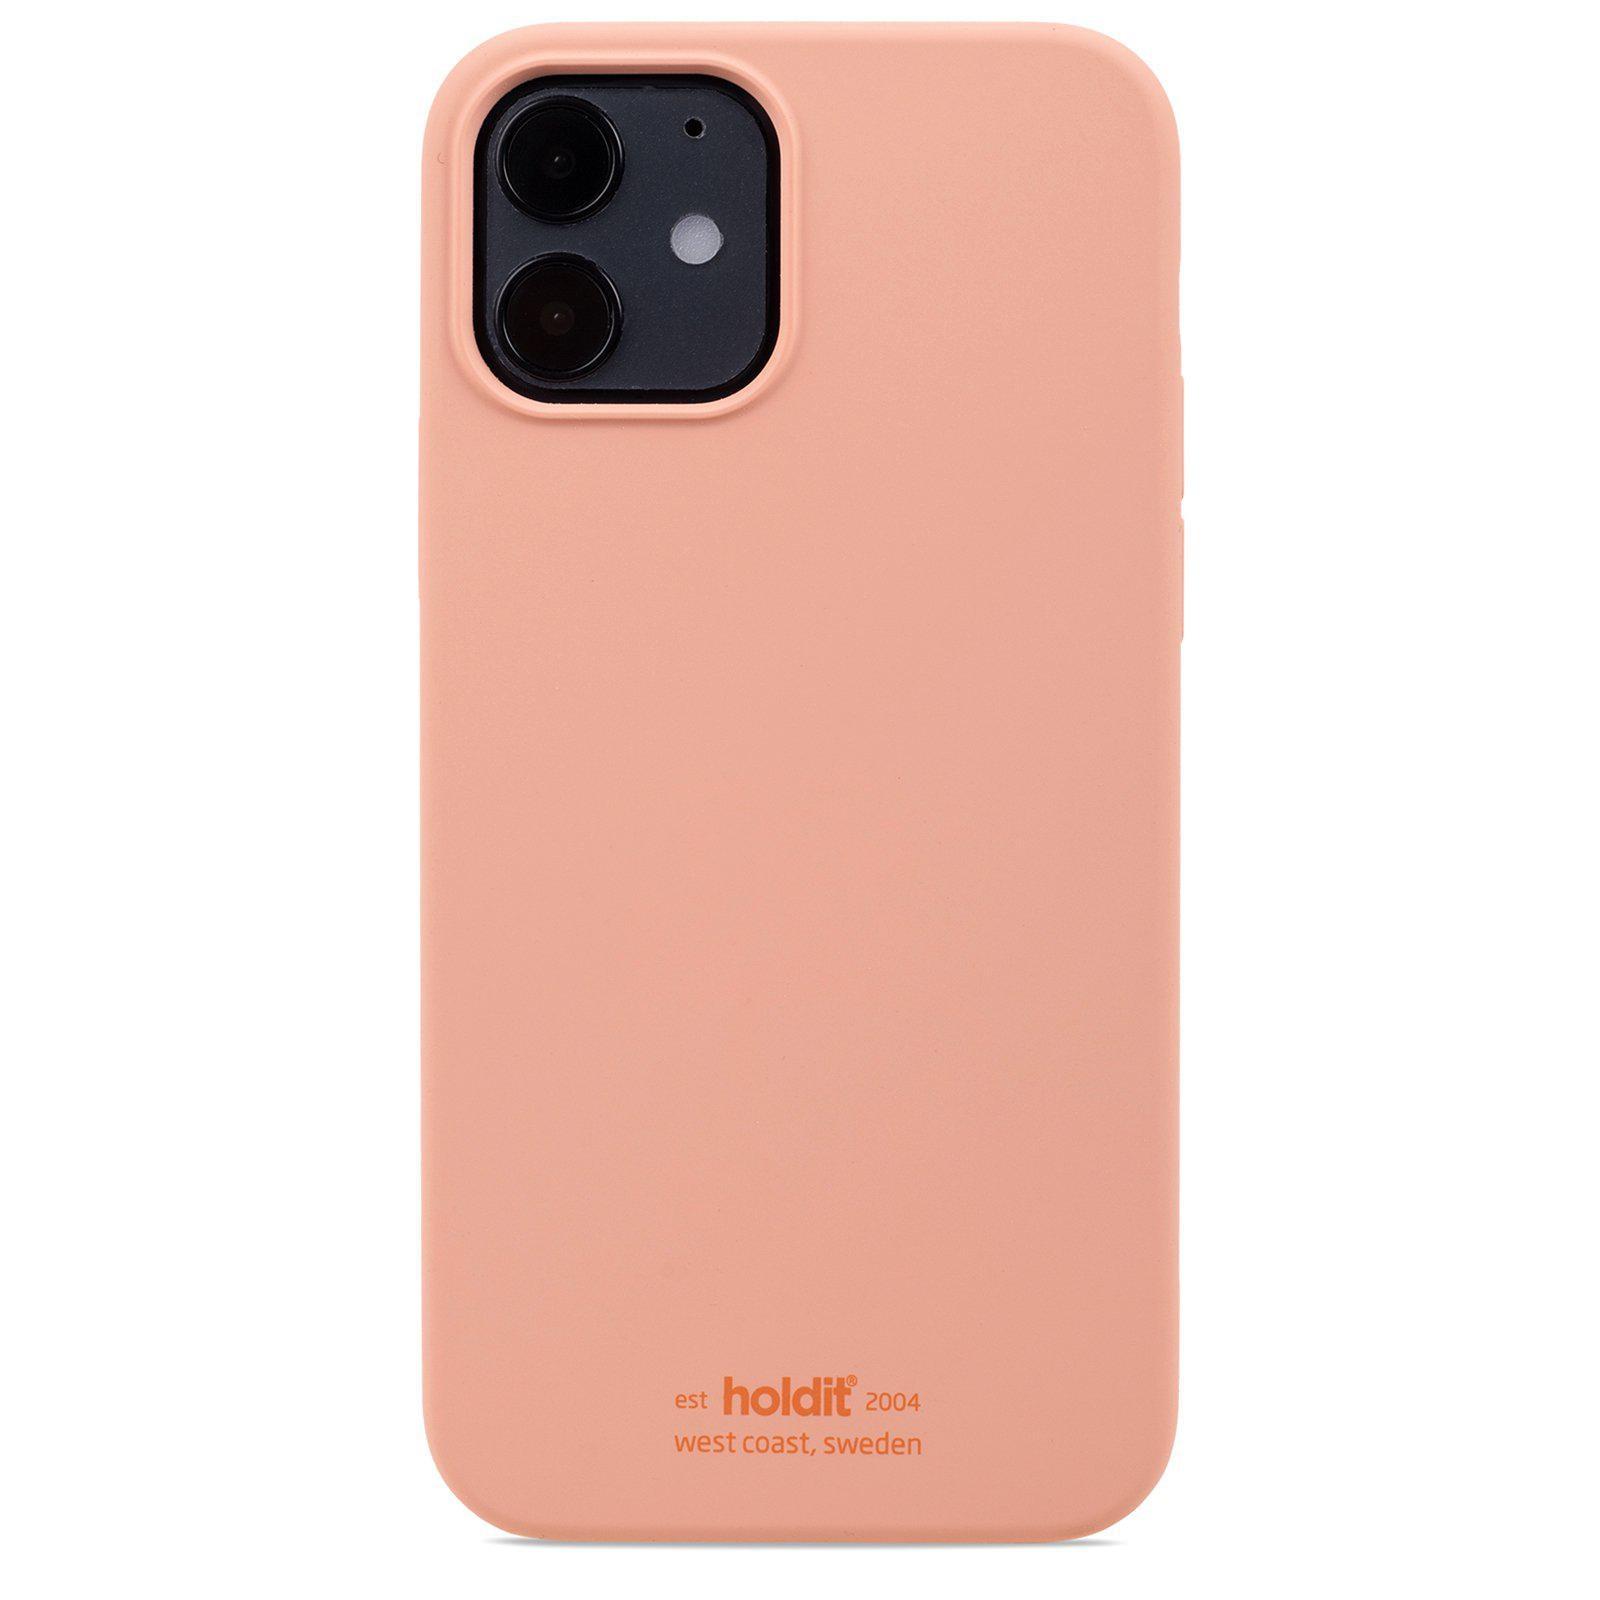 Silikonikuori iPhone 12/12 Pro Pink Peach